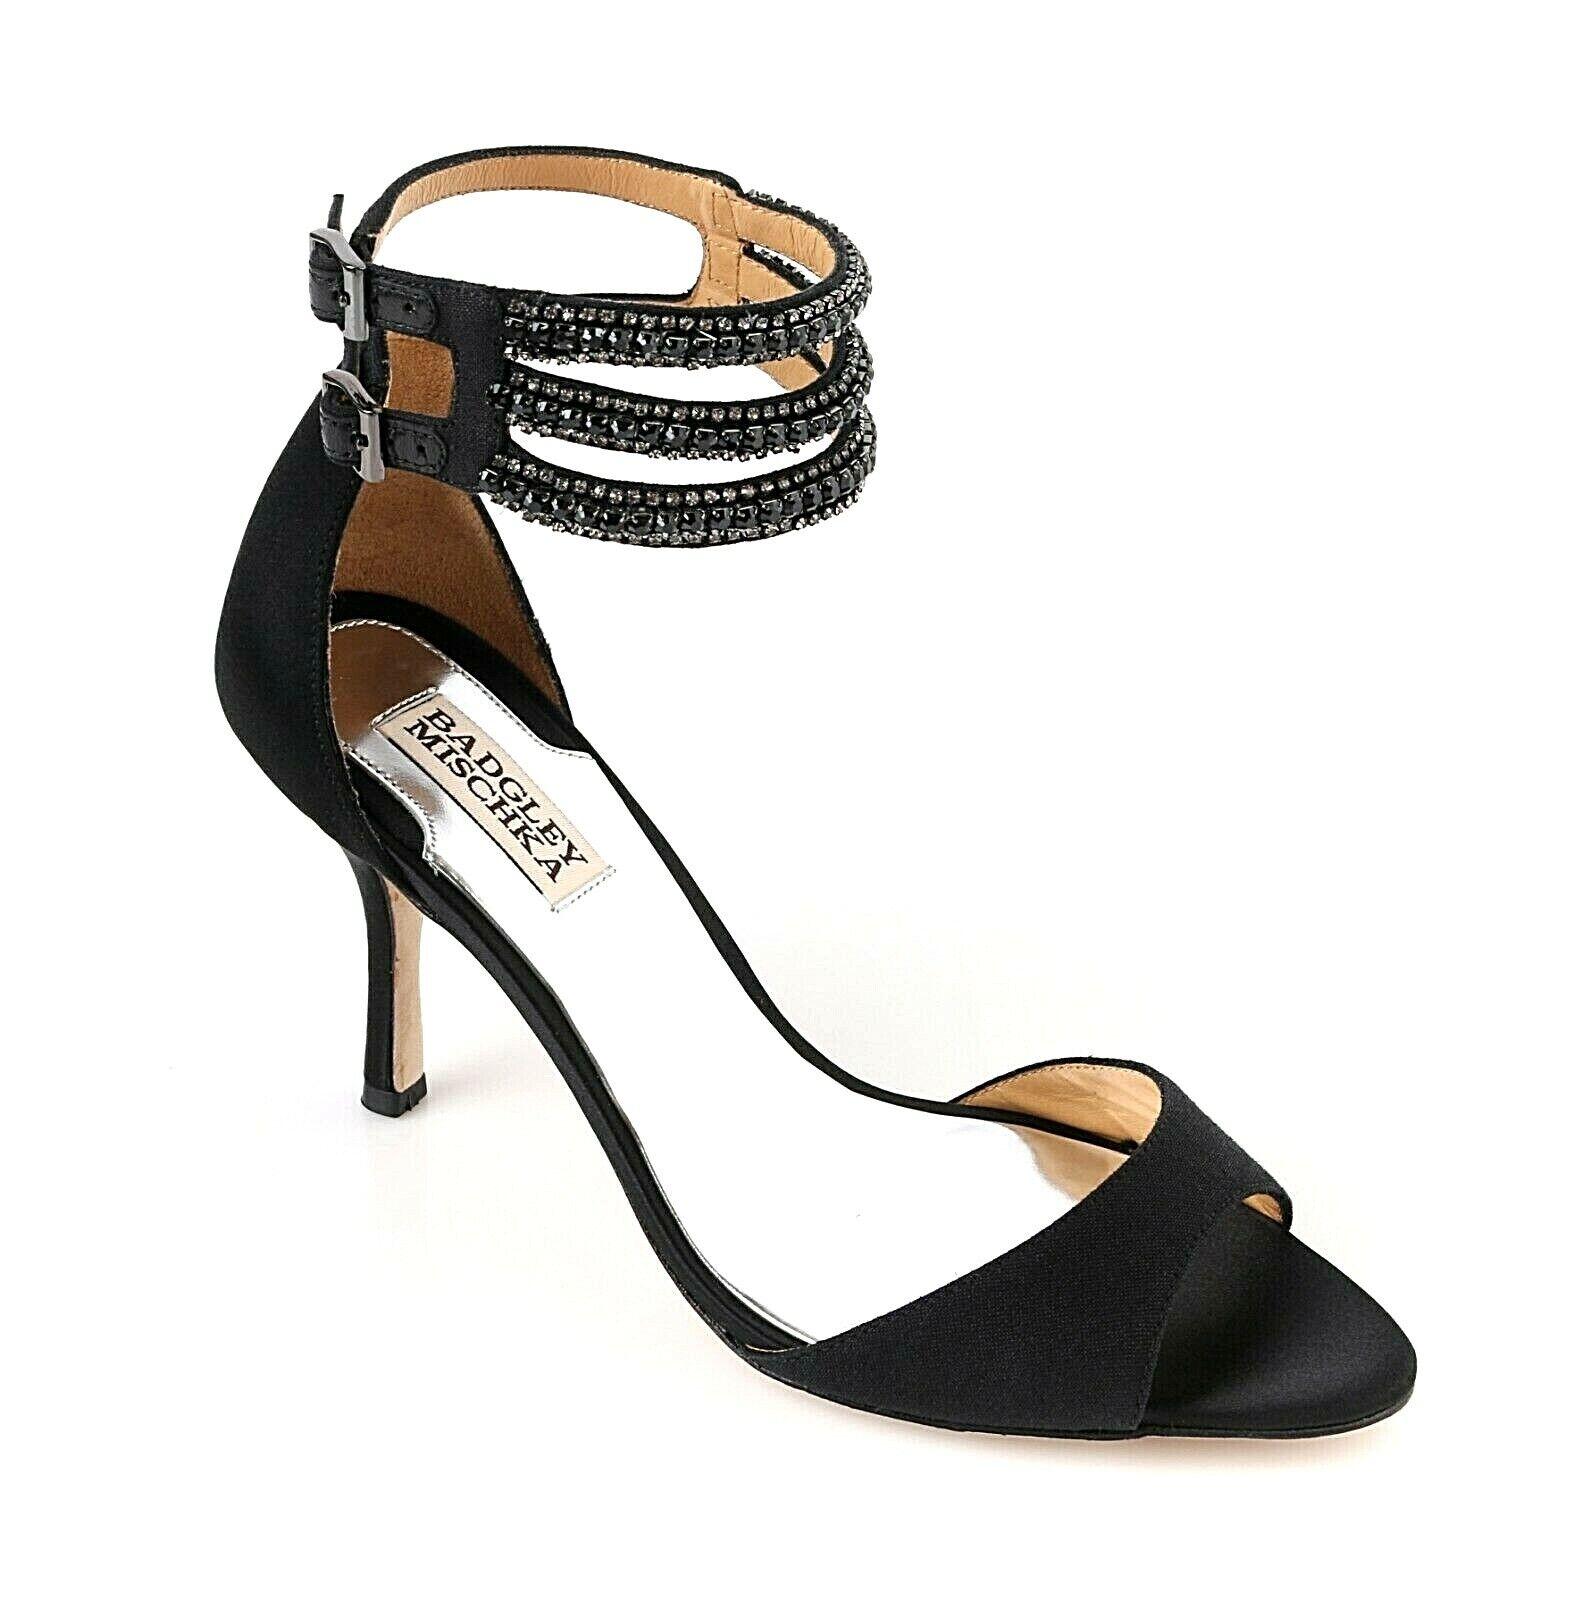 BADGLEY MISCHKA  Dazzler  Black Satin Rhinestone Ankle Strap Sandals Heels 8 NIB